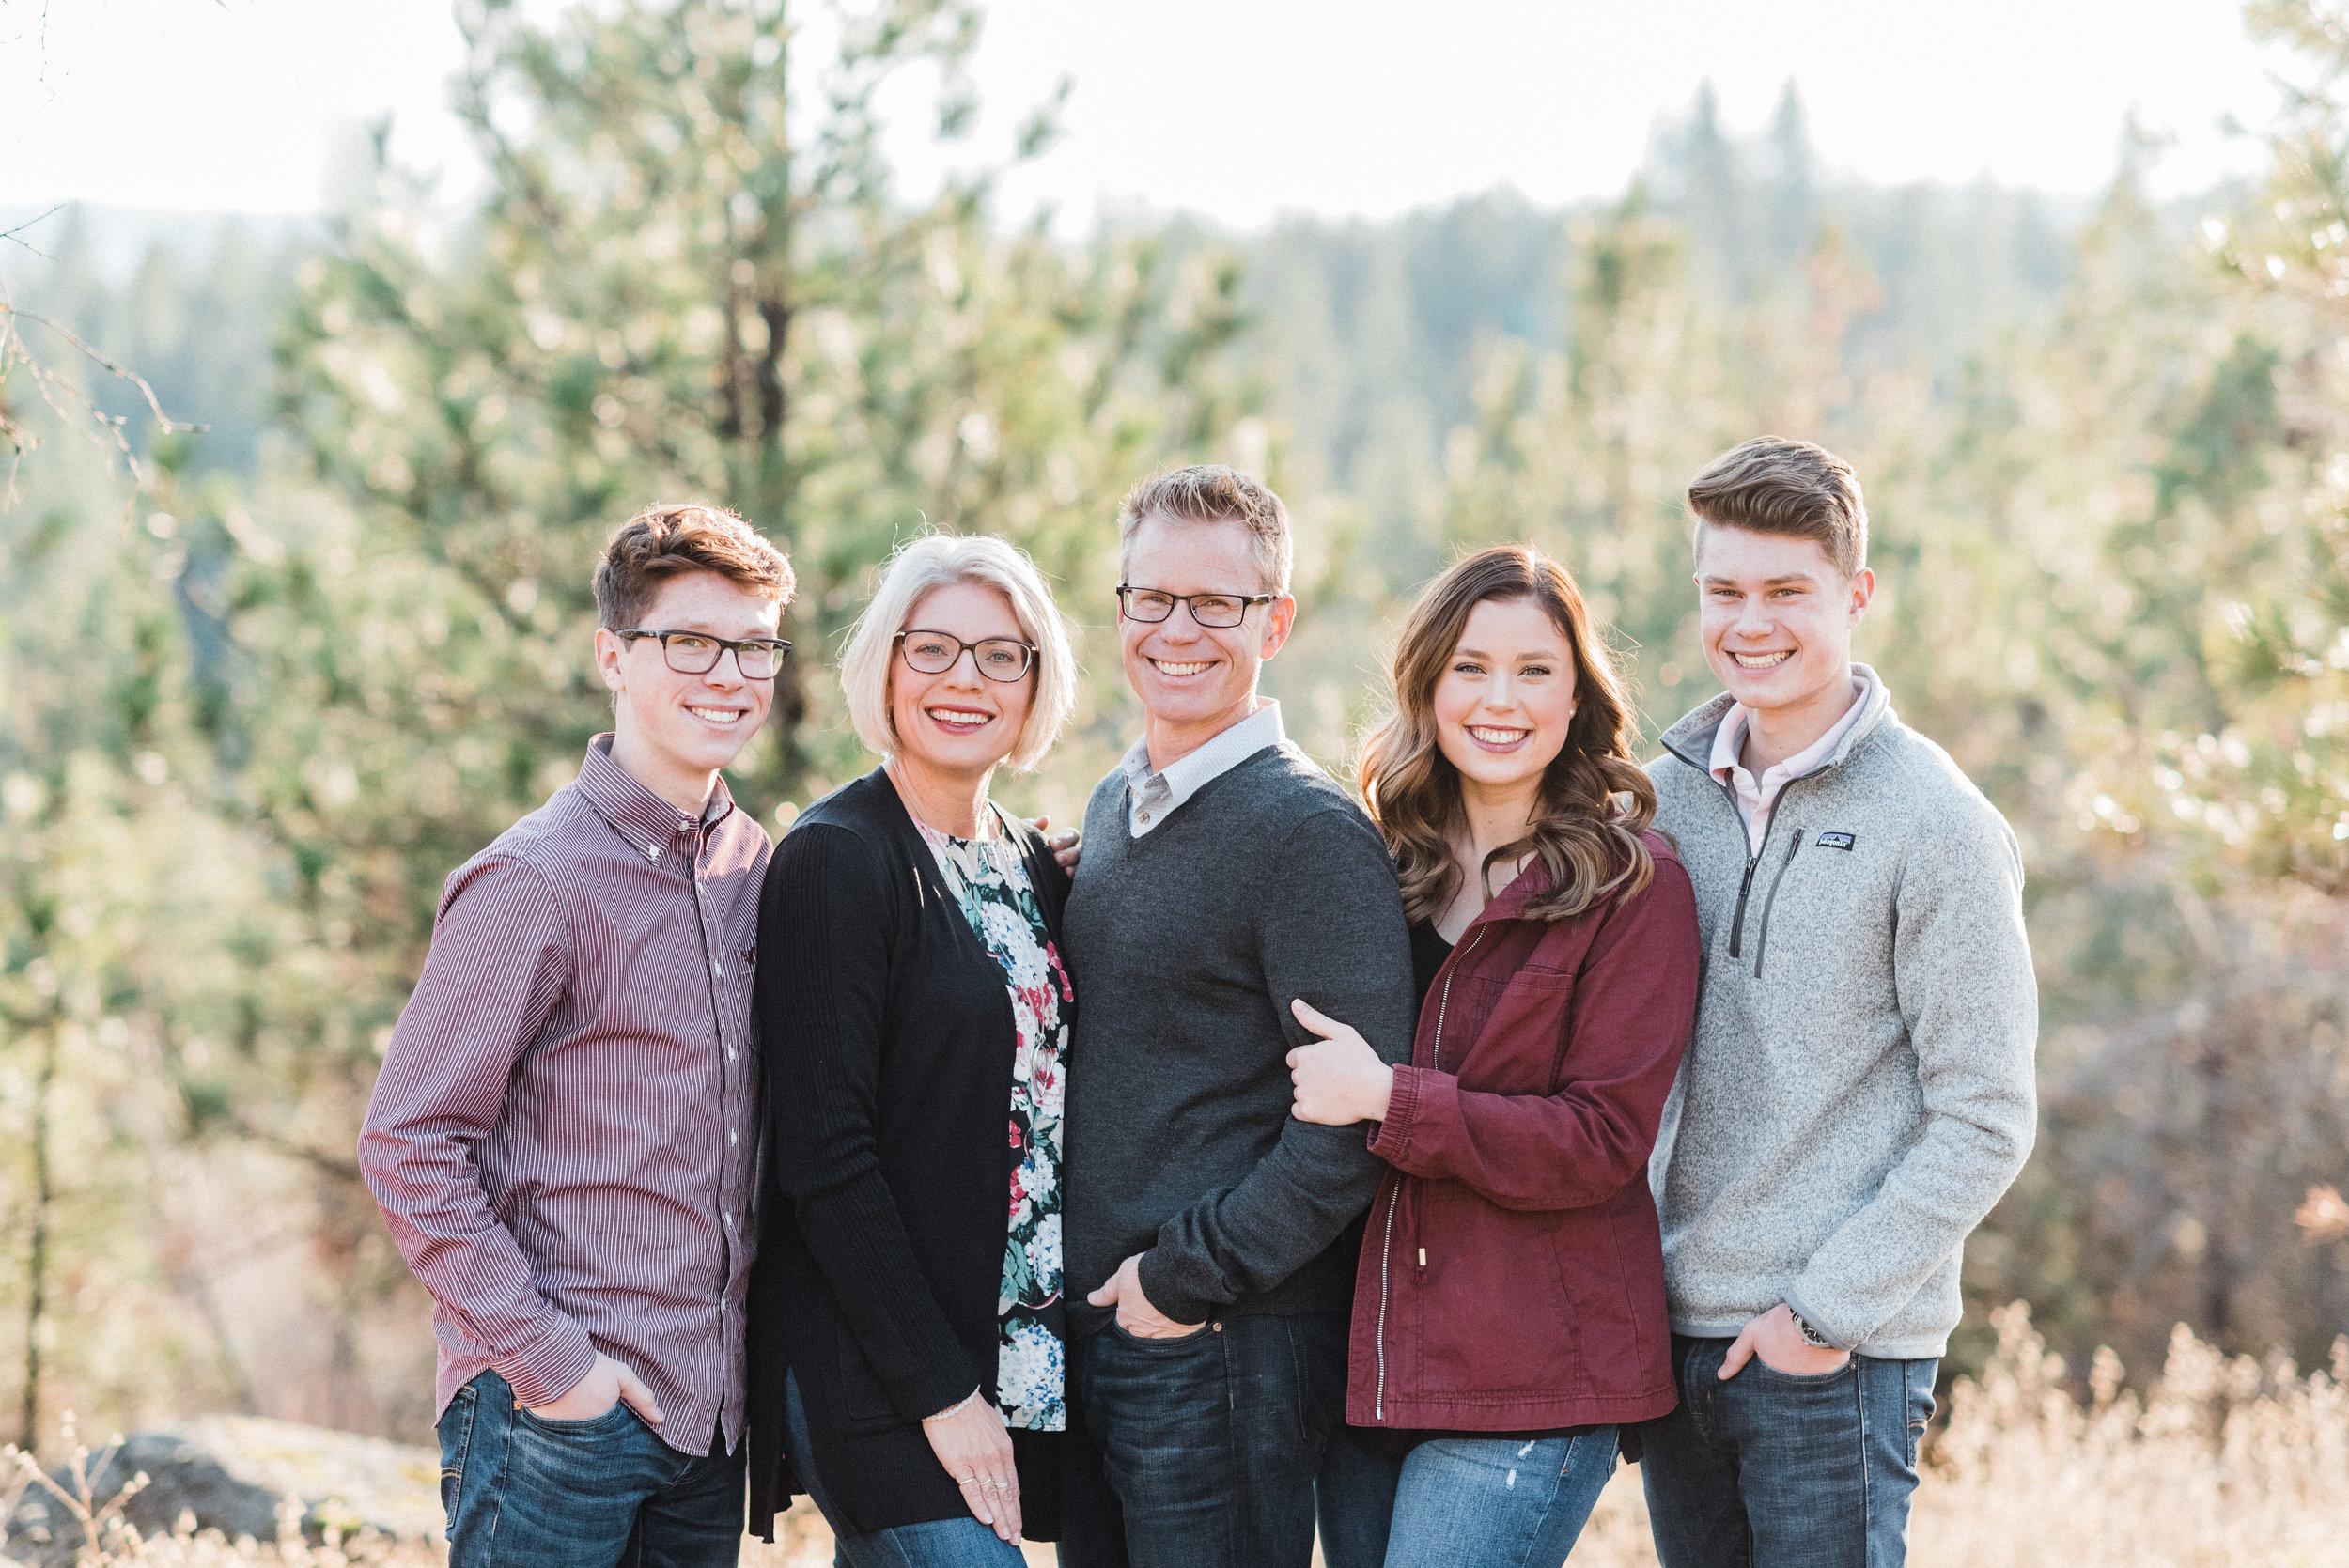 spokane_family_photographer_hammond (2 of 15).jpg